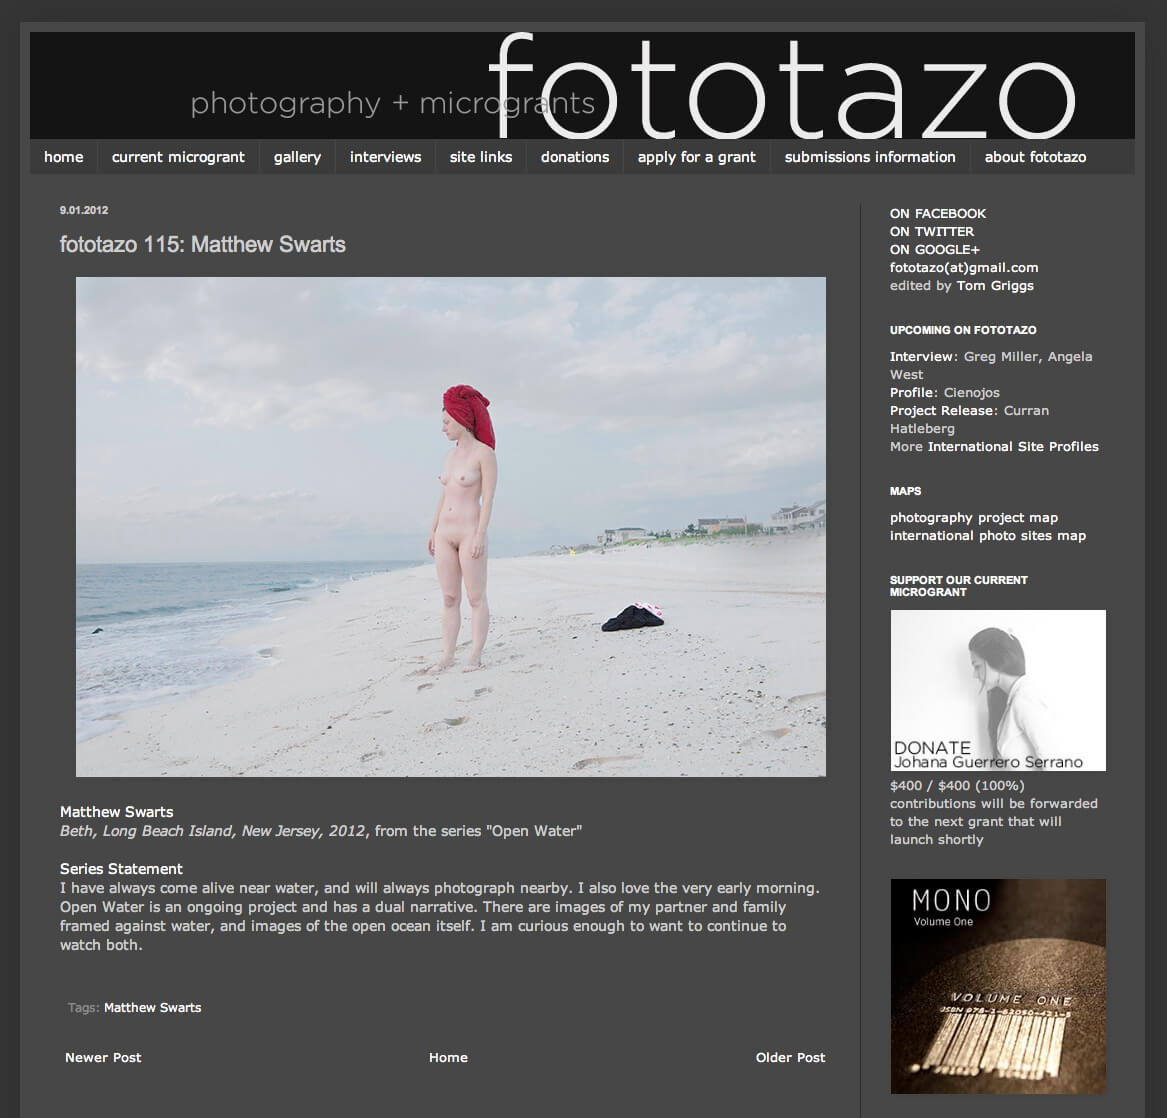 Matthew Swarts + Fototazo